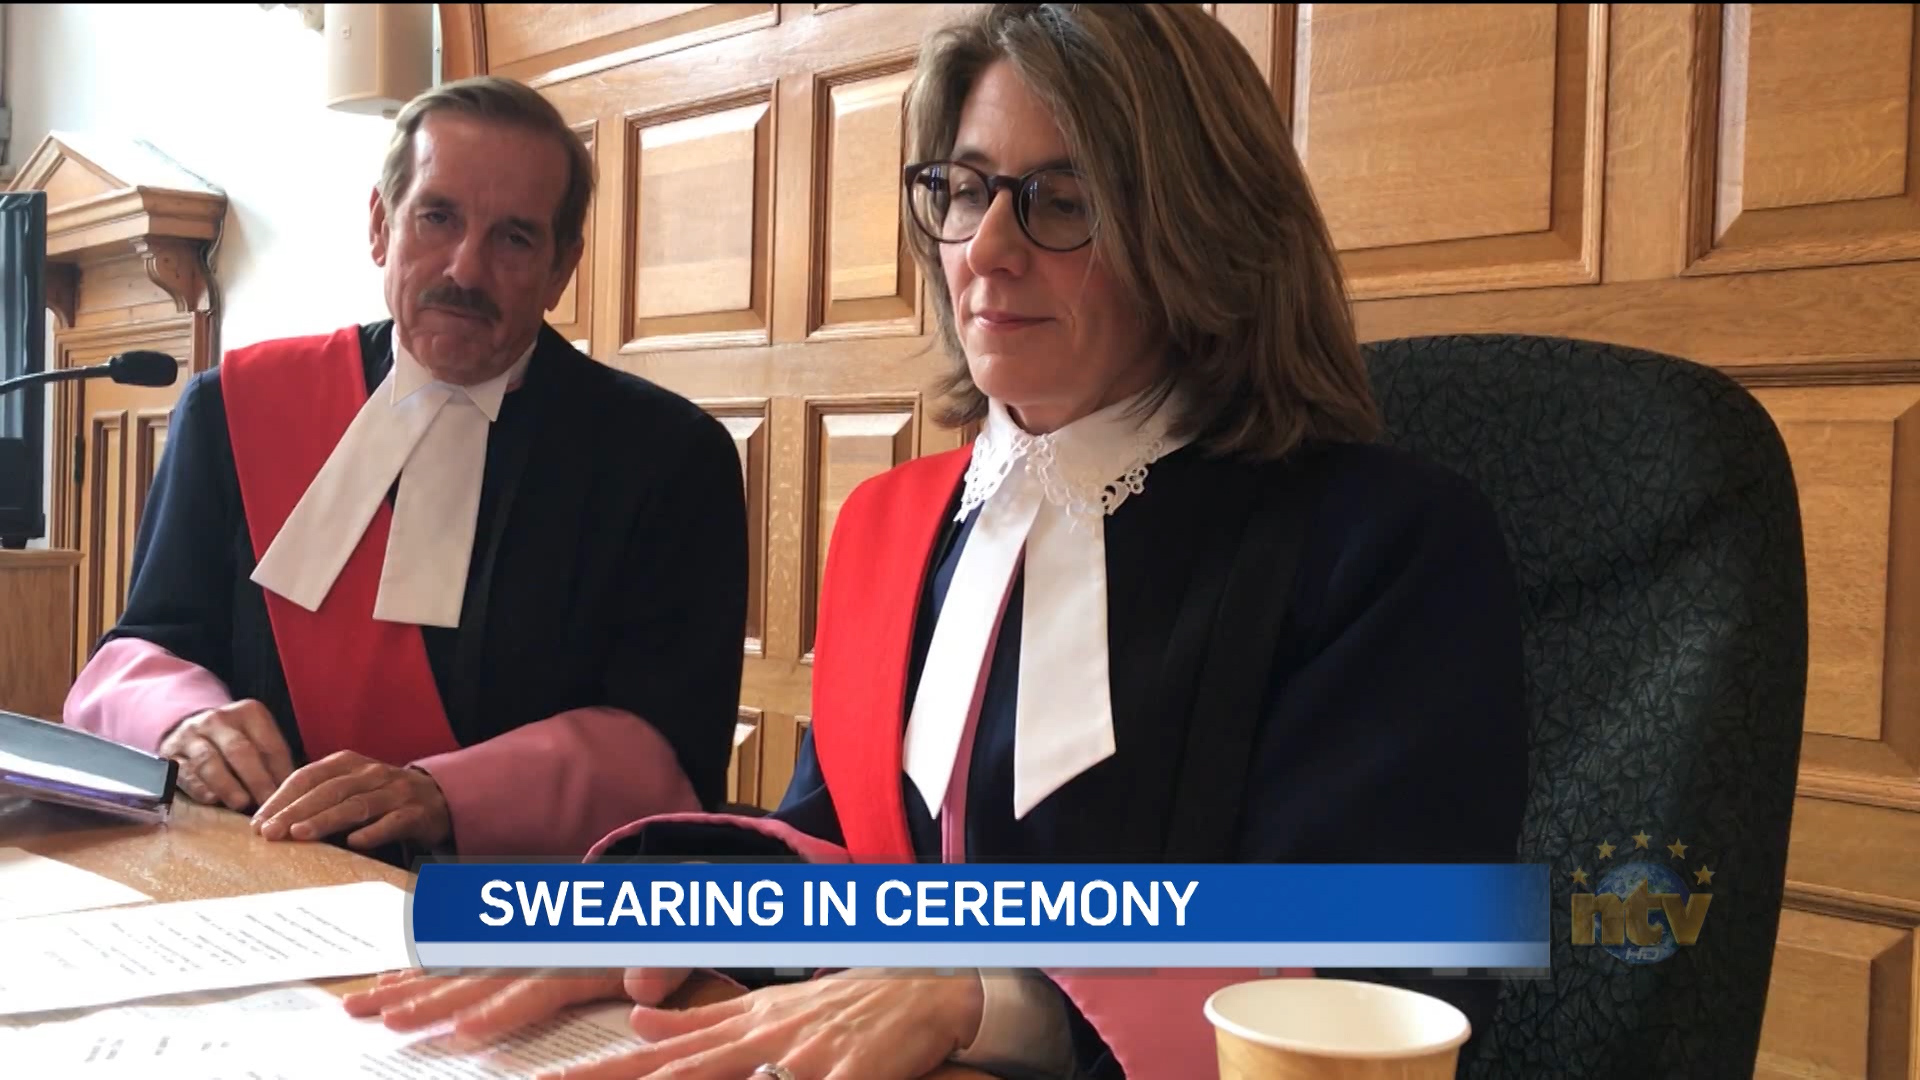 Kate O'Brien sworn in as new Supreme Court justice - ntv.ca